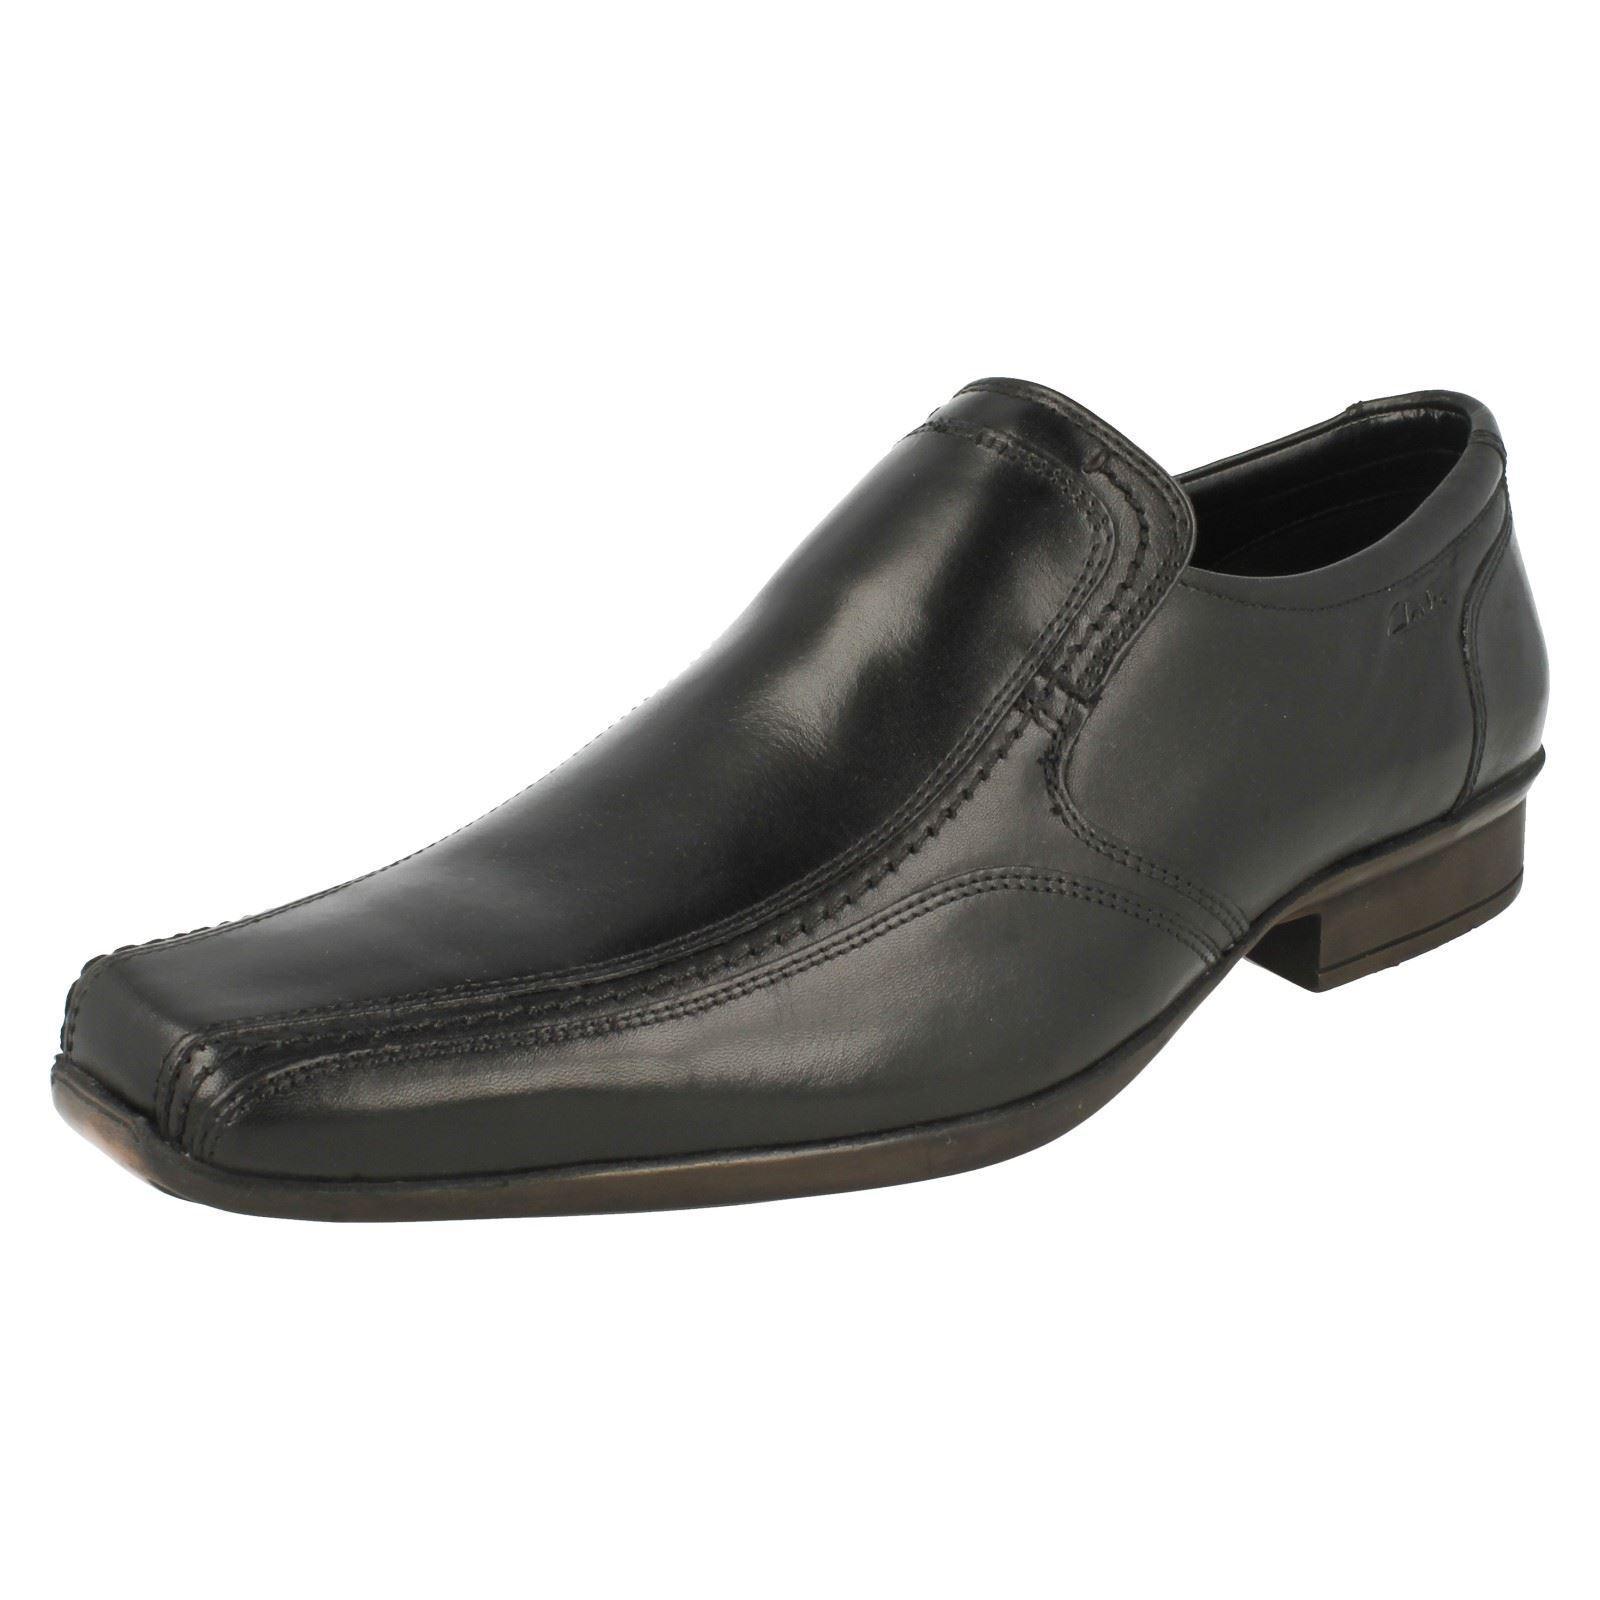 Uomo On Clarks Formal Slip On Uomo Schuhes 'Affix Step' a68c3b